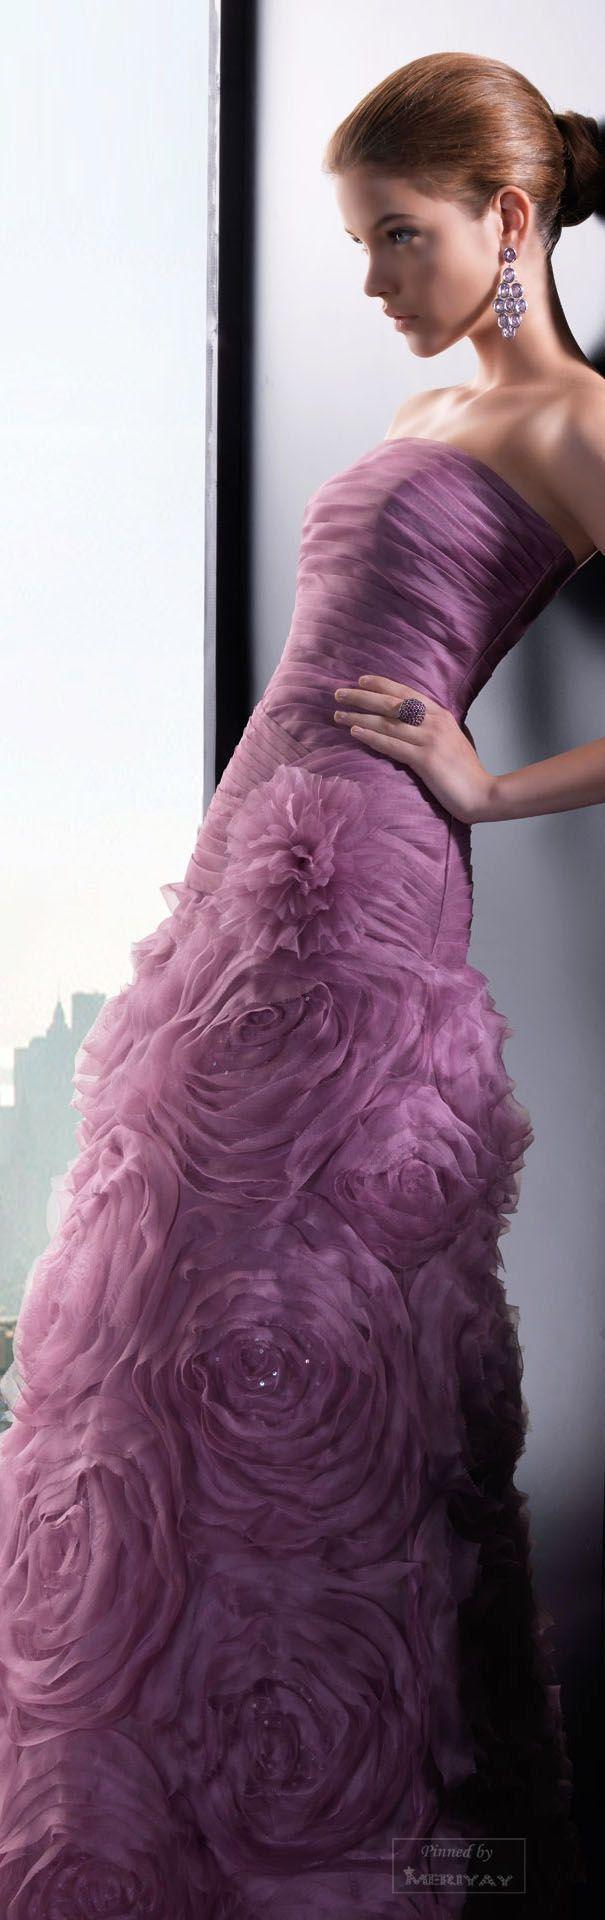 Vistoso Vestidos De Dama En Glasgow Cresta - Ideas de Estilos de ...